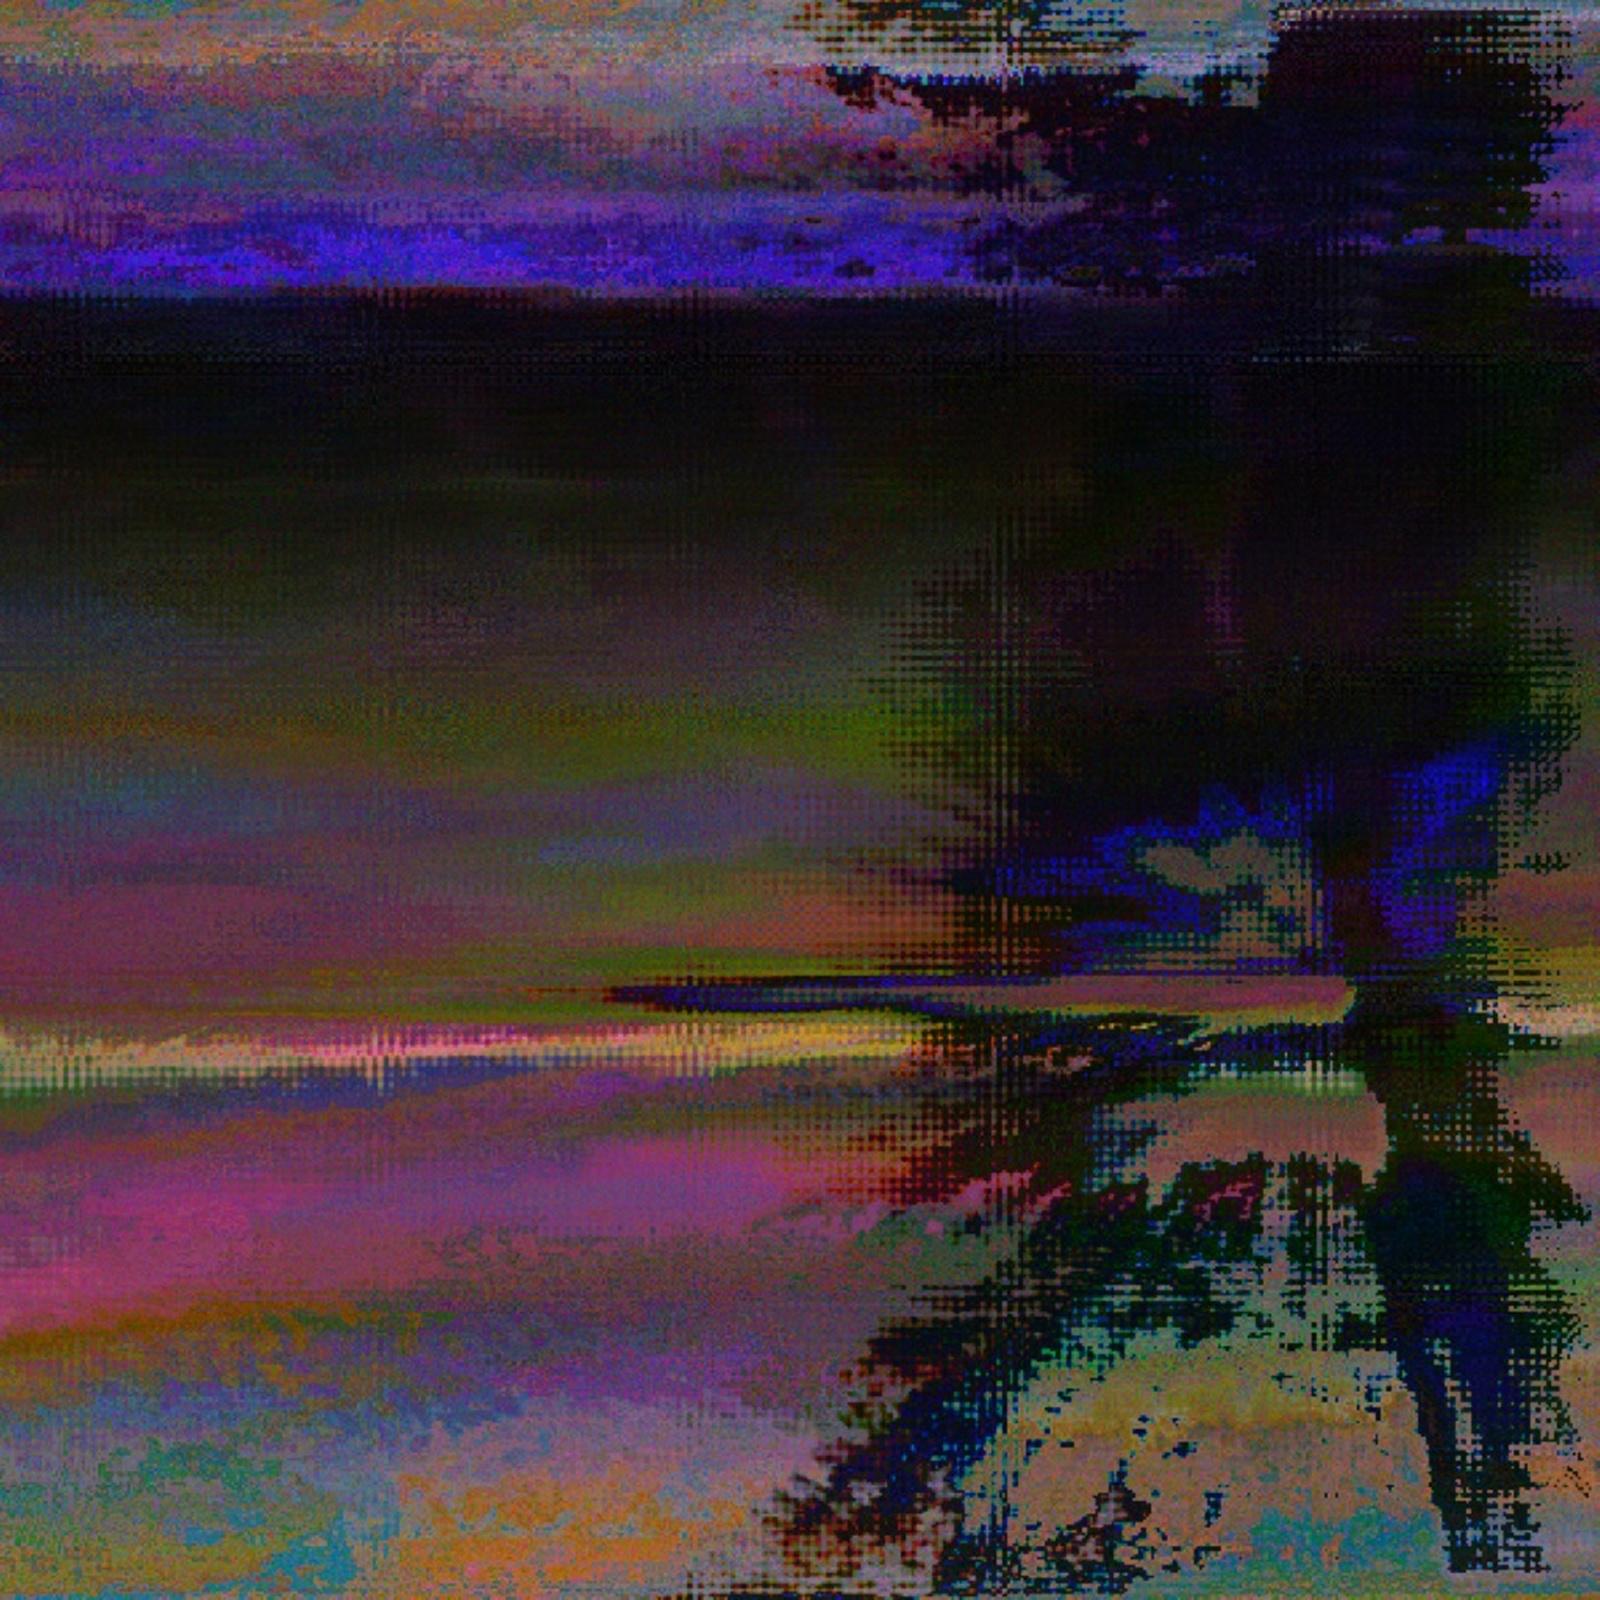 162653-8400044-black_hole_glitch.jpg